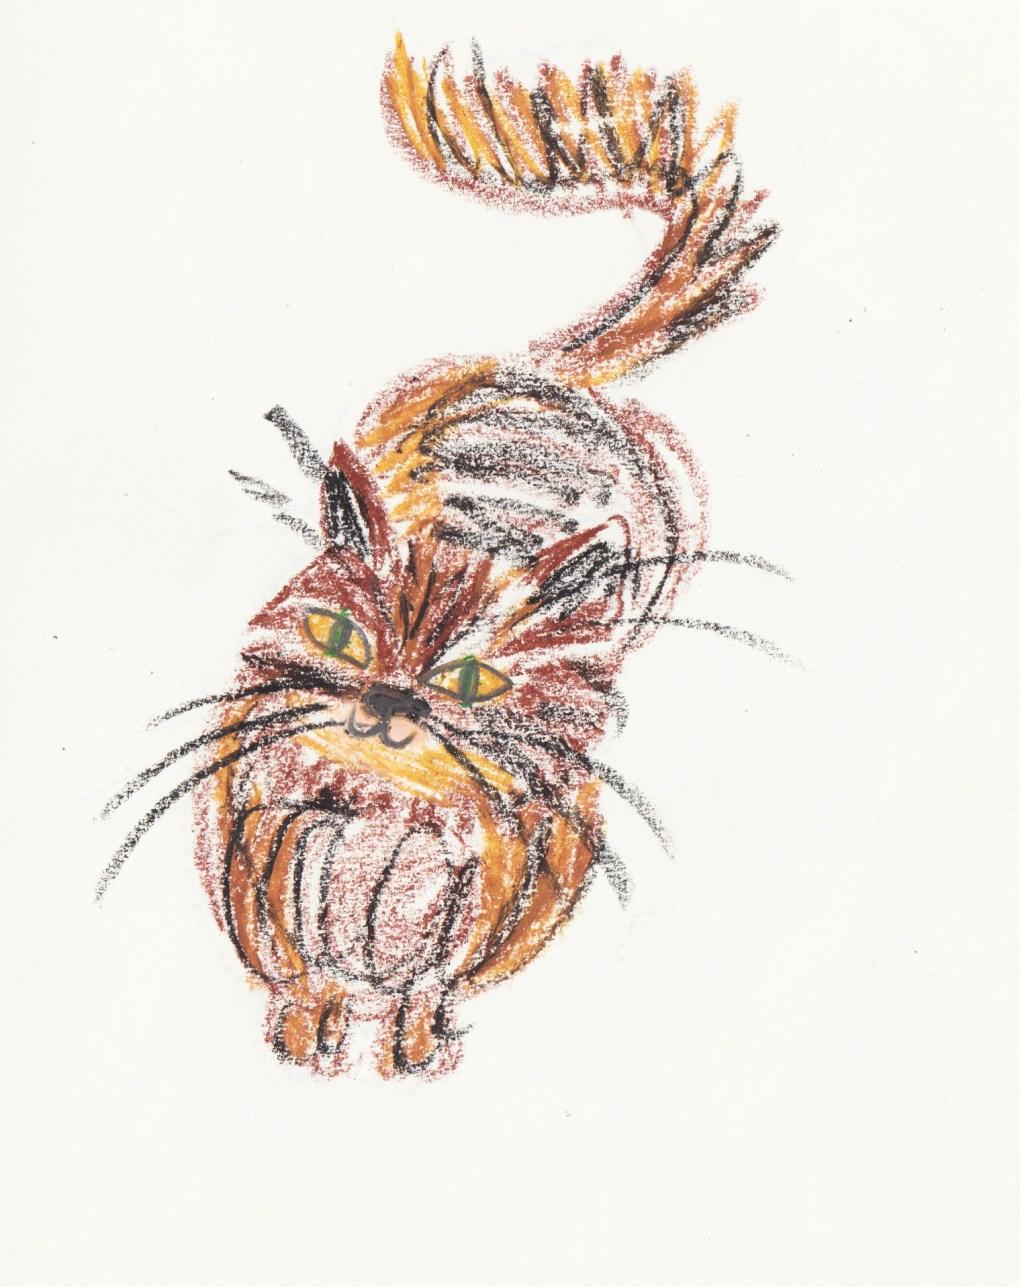 drawing-challenge-cat